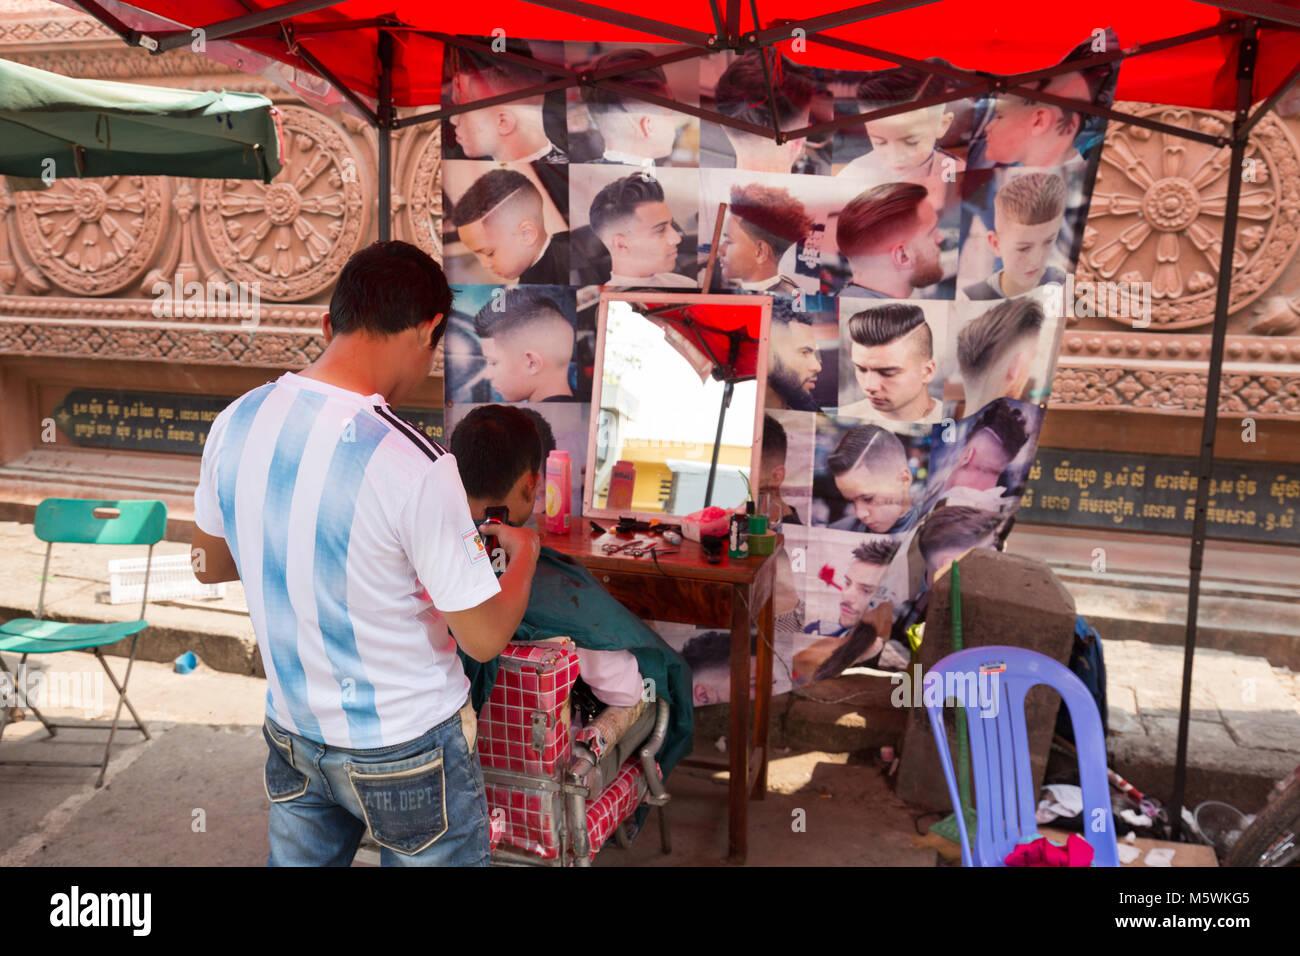 Mens Friseur an einem strassenrand Arbeiten ausgeht, Phnom Penh, Kambodscha Asien Stockbild